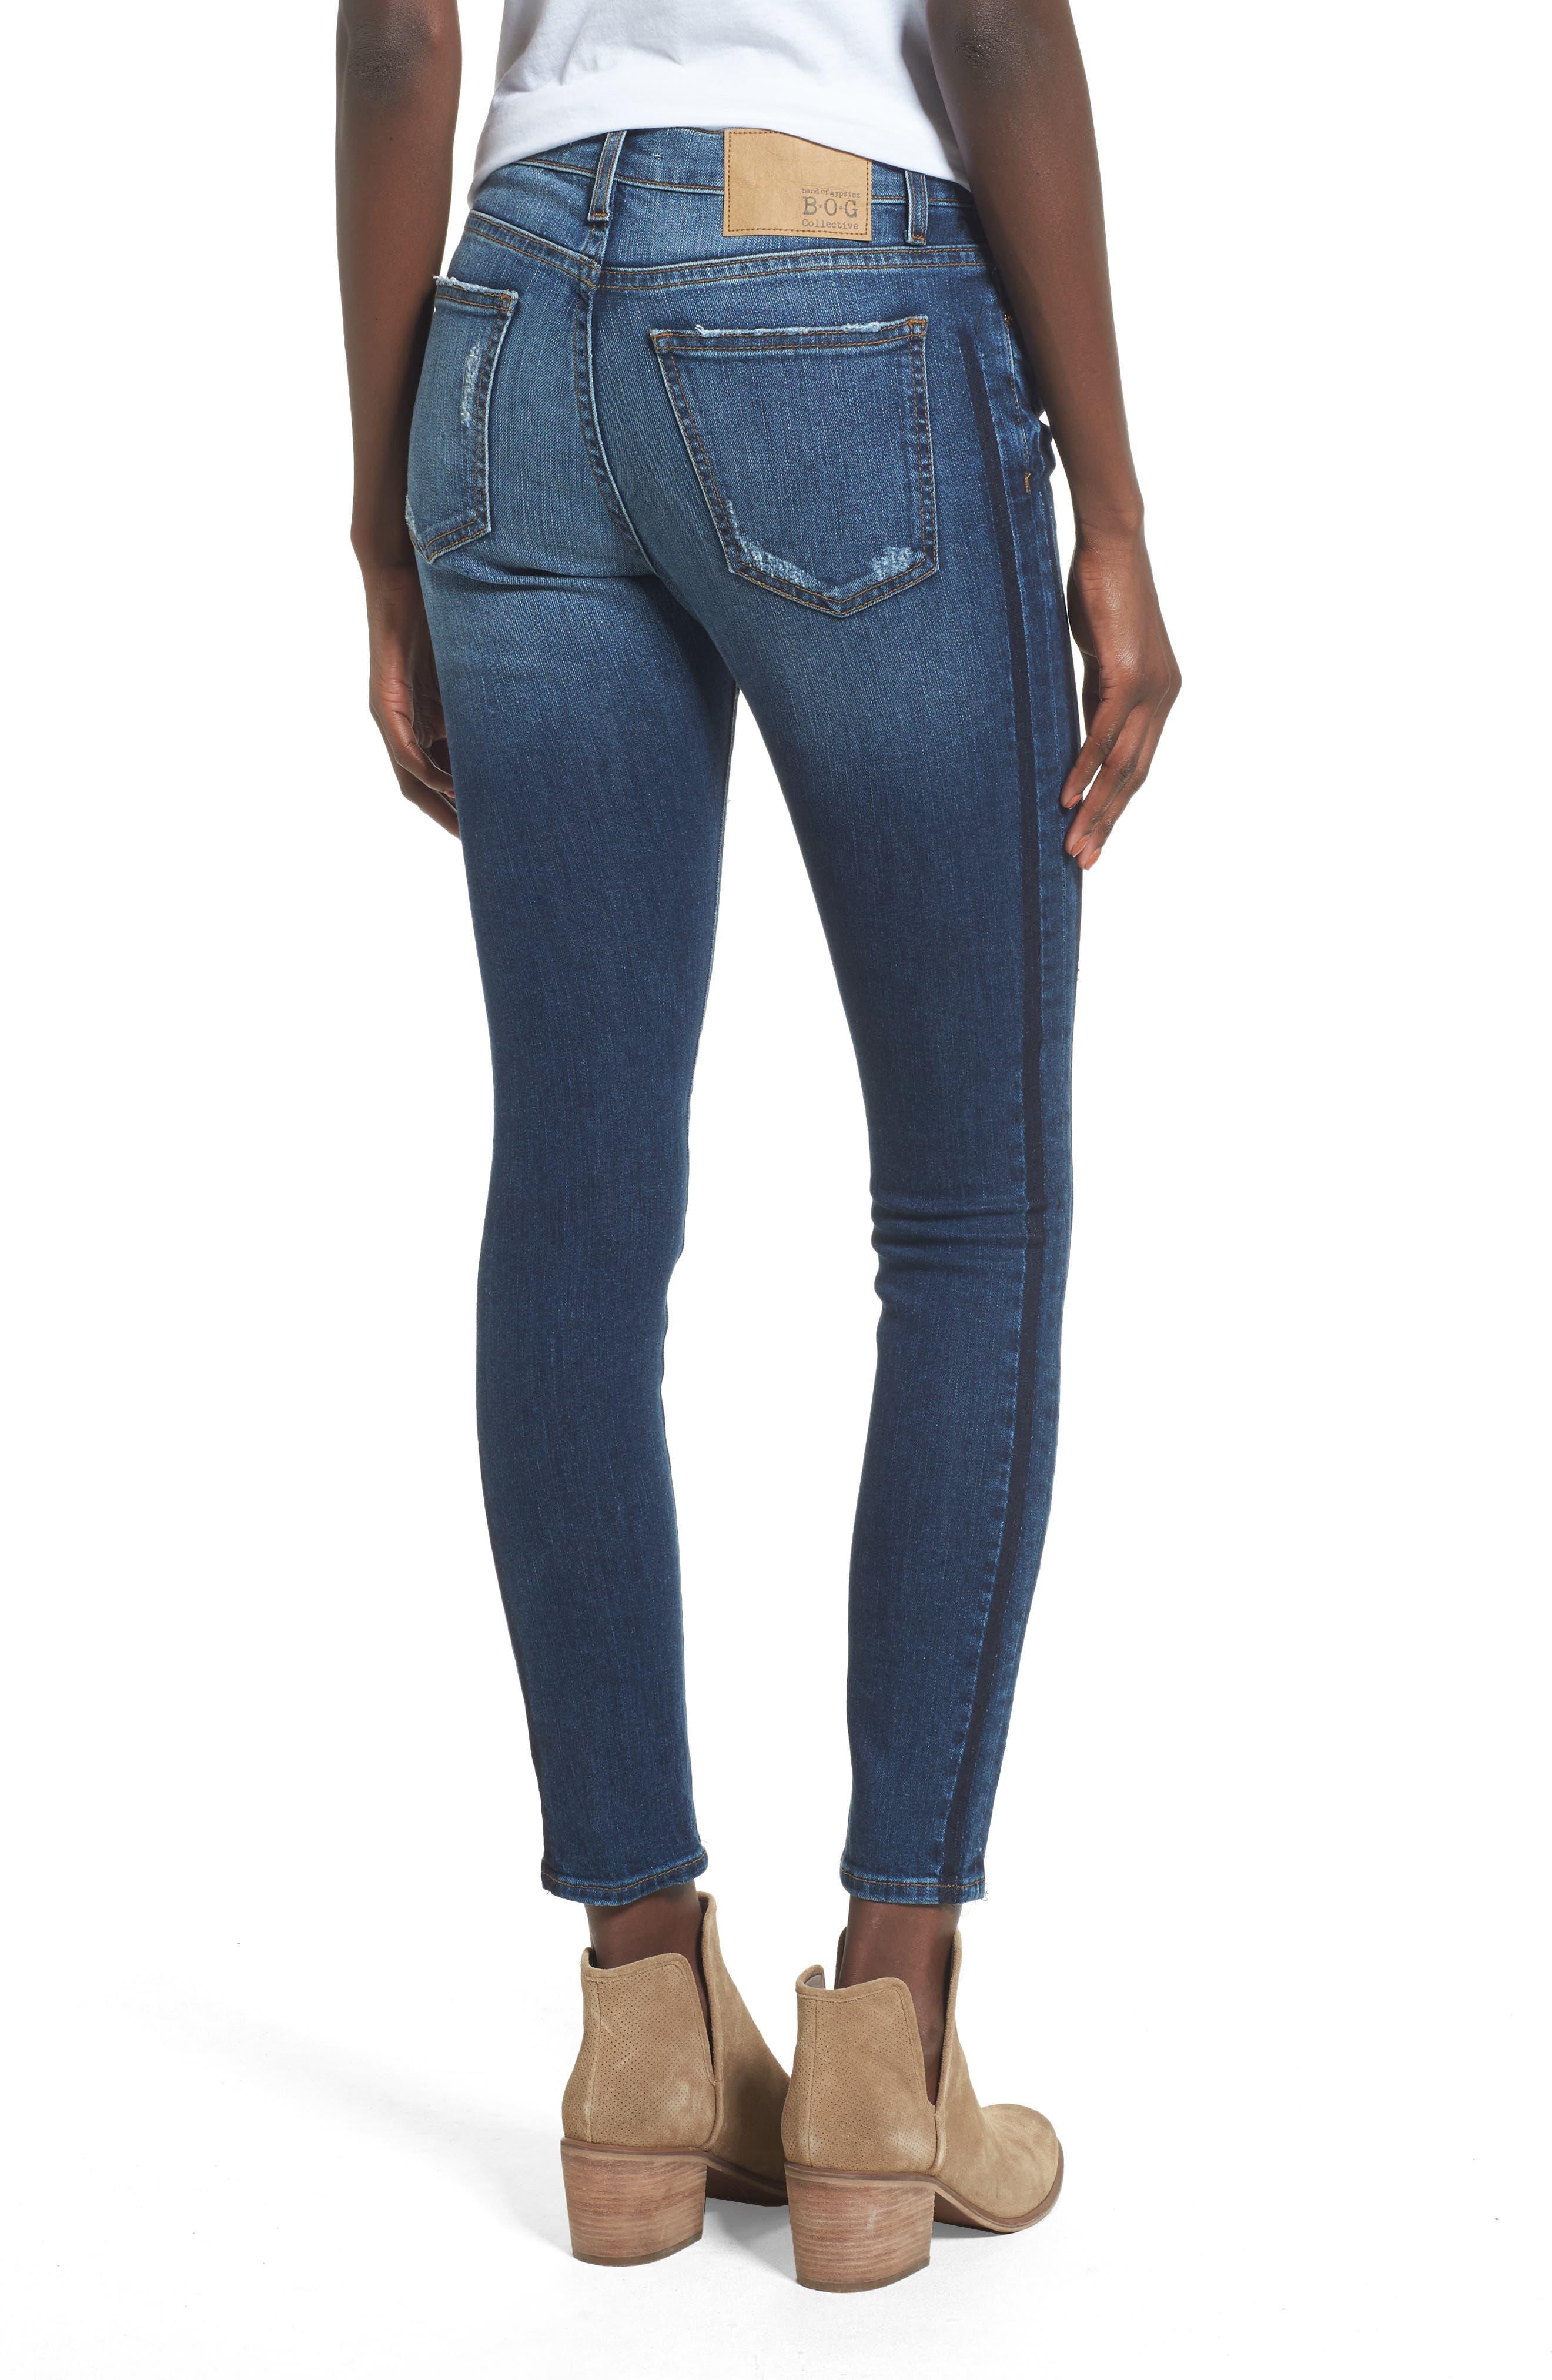 Lola Ripped Skinny Jeans,                             Alternate thumbnail 2, color,                             Carlsbad Fest East